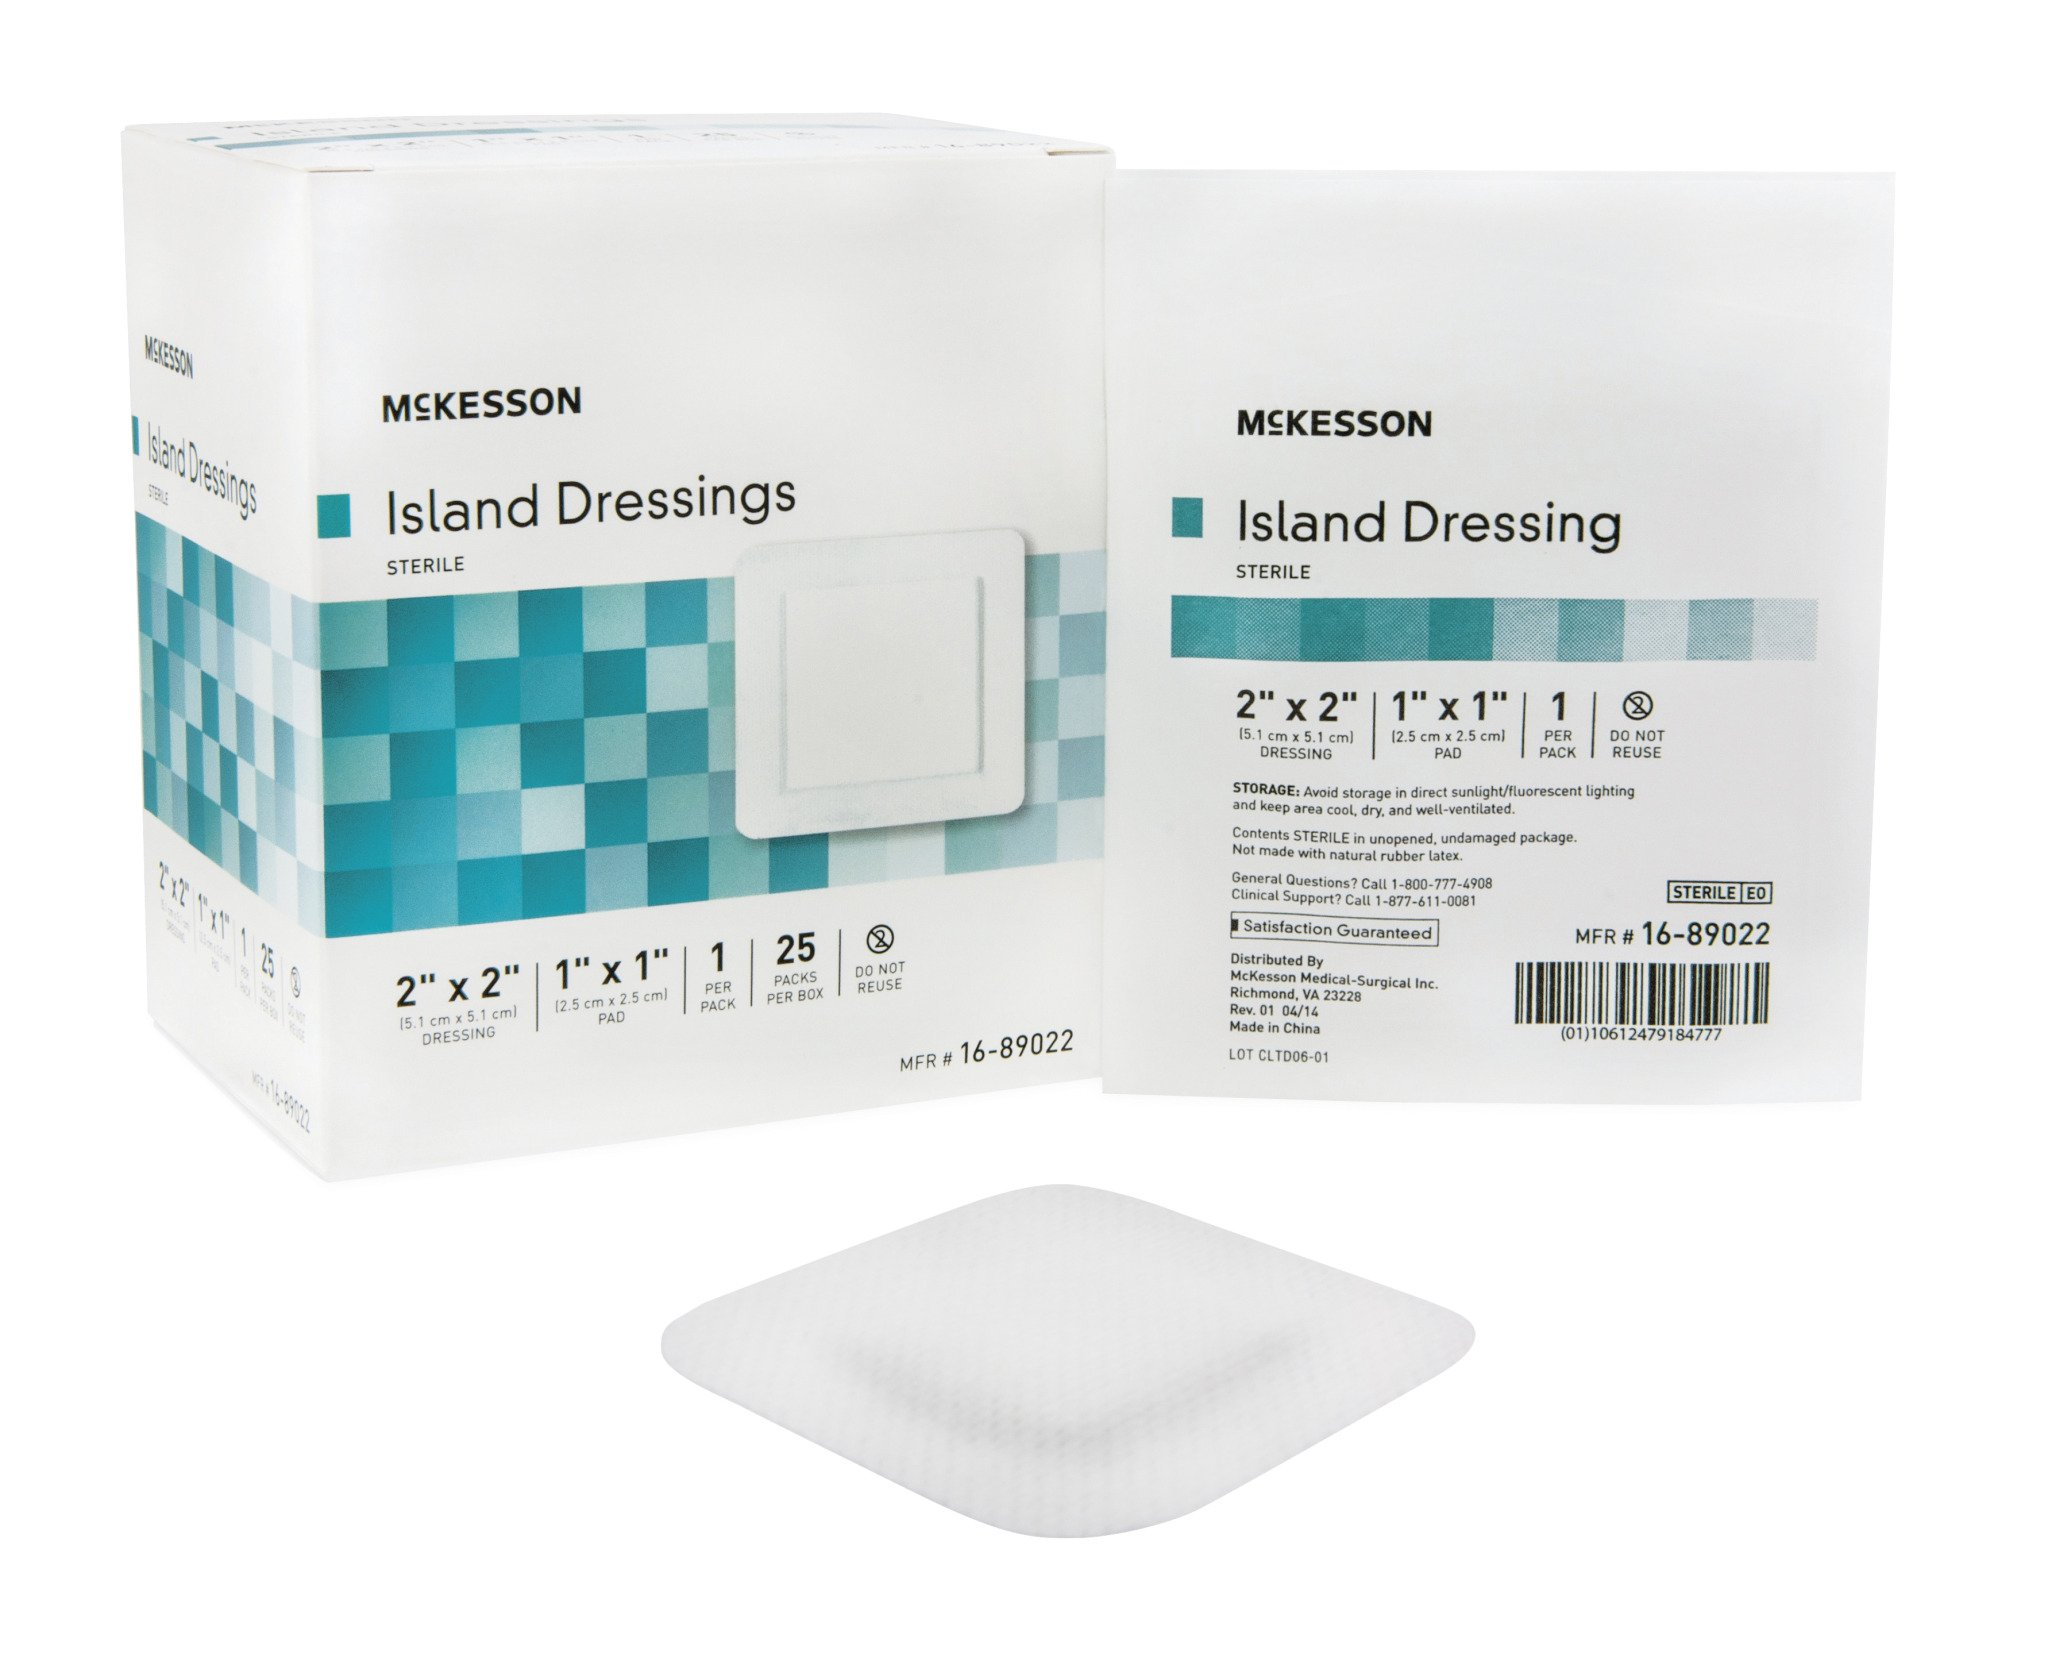 Adhesive Island Dressing McKesson 2 X 2 Inch Polypropylene / Rayon Square 1 X 1 Inch Pad White Sterile - 25/BX (MFN # 16-89022)